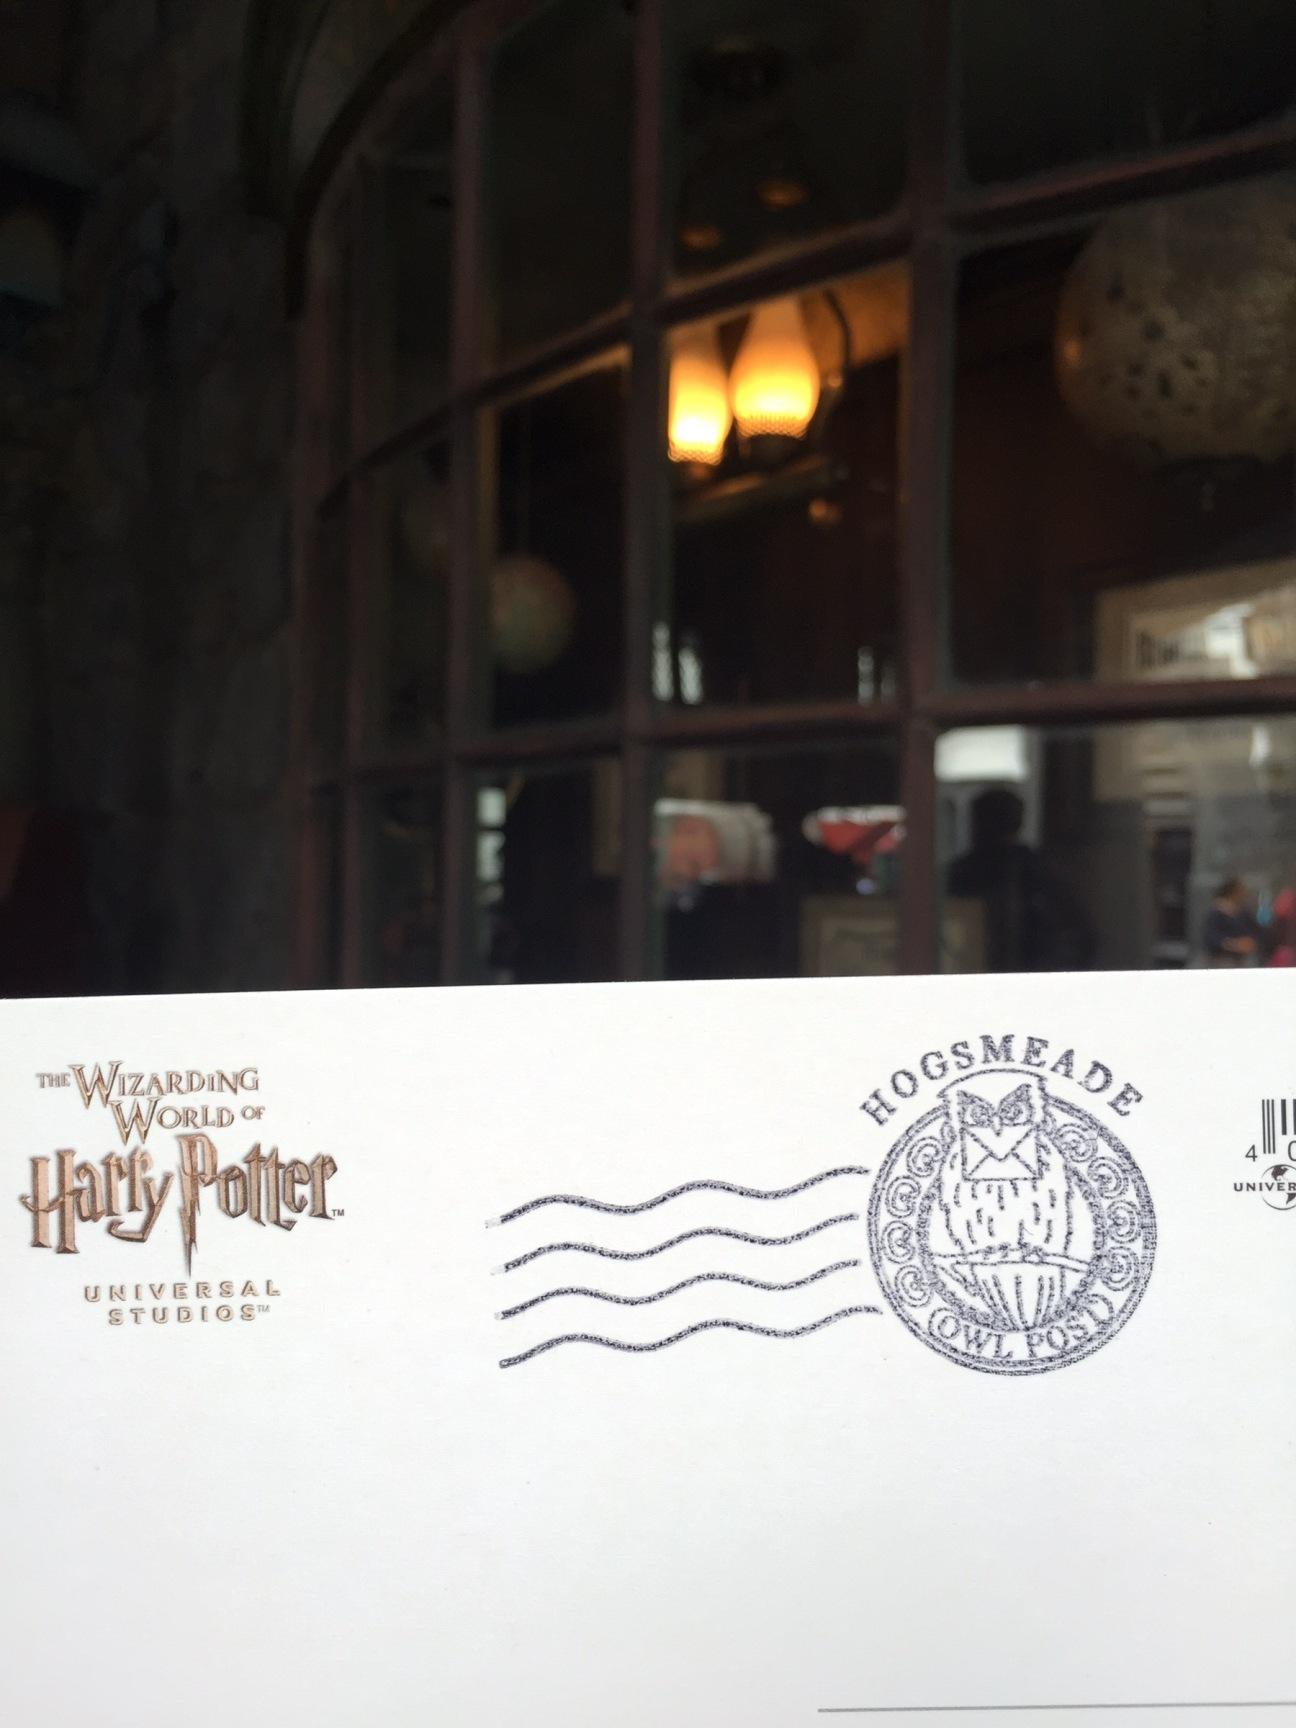 Hand canceled stamp